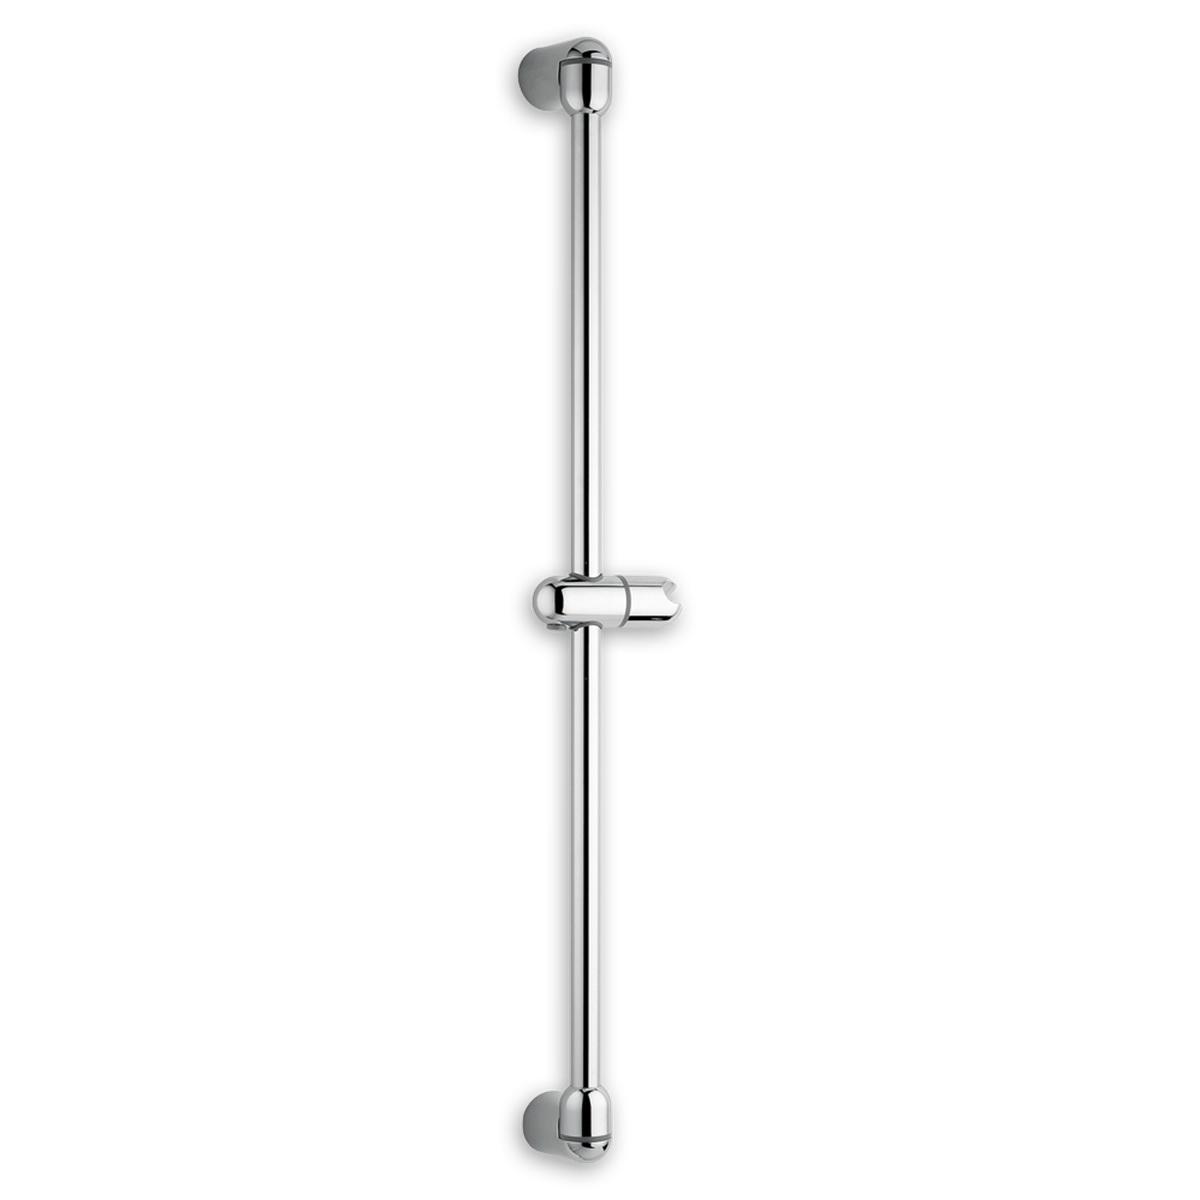 American Standard 1660236.002 Standard Slide Bar, 36 in OAL x 35-3/8 in OAD, Chrome Plated, Import